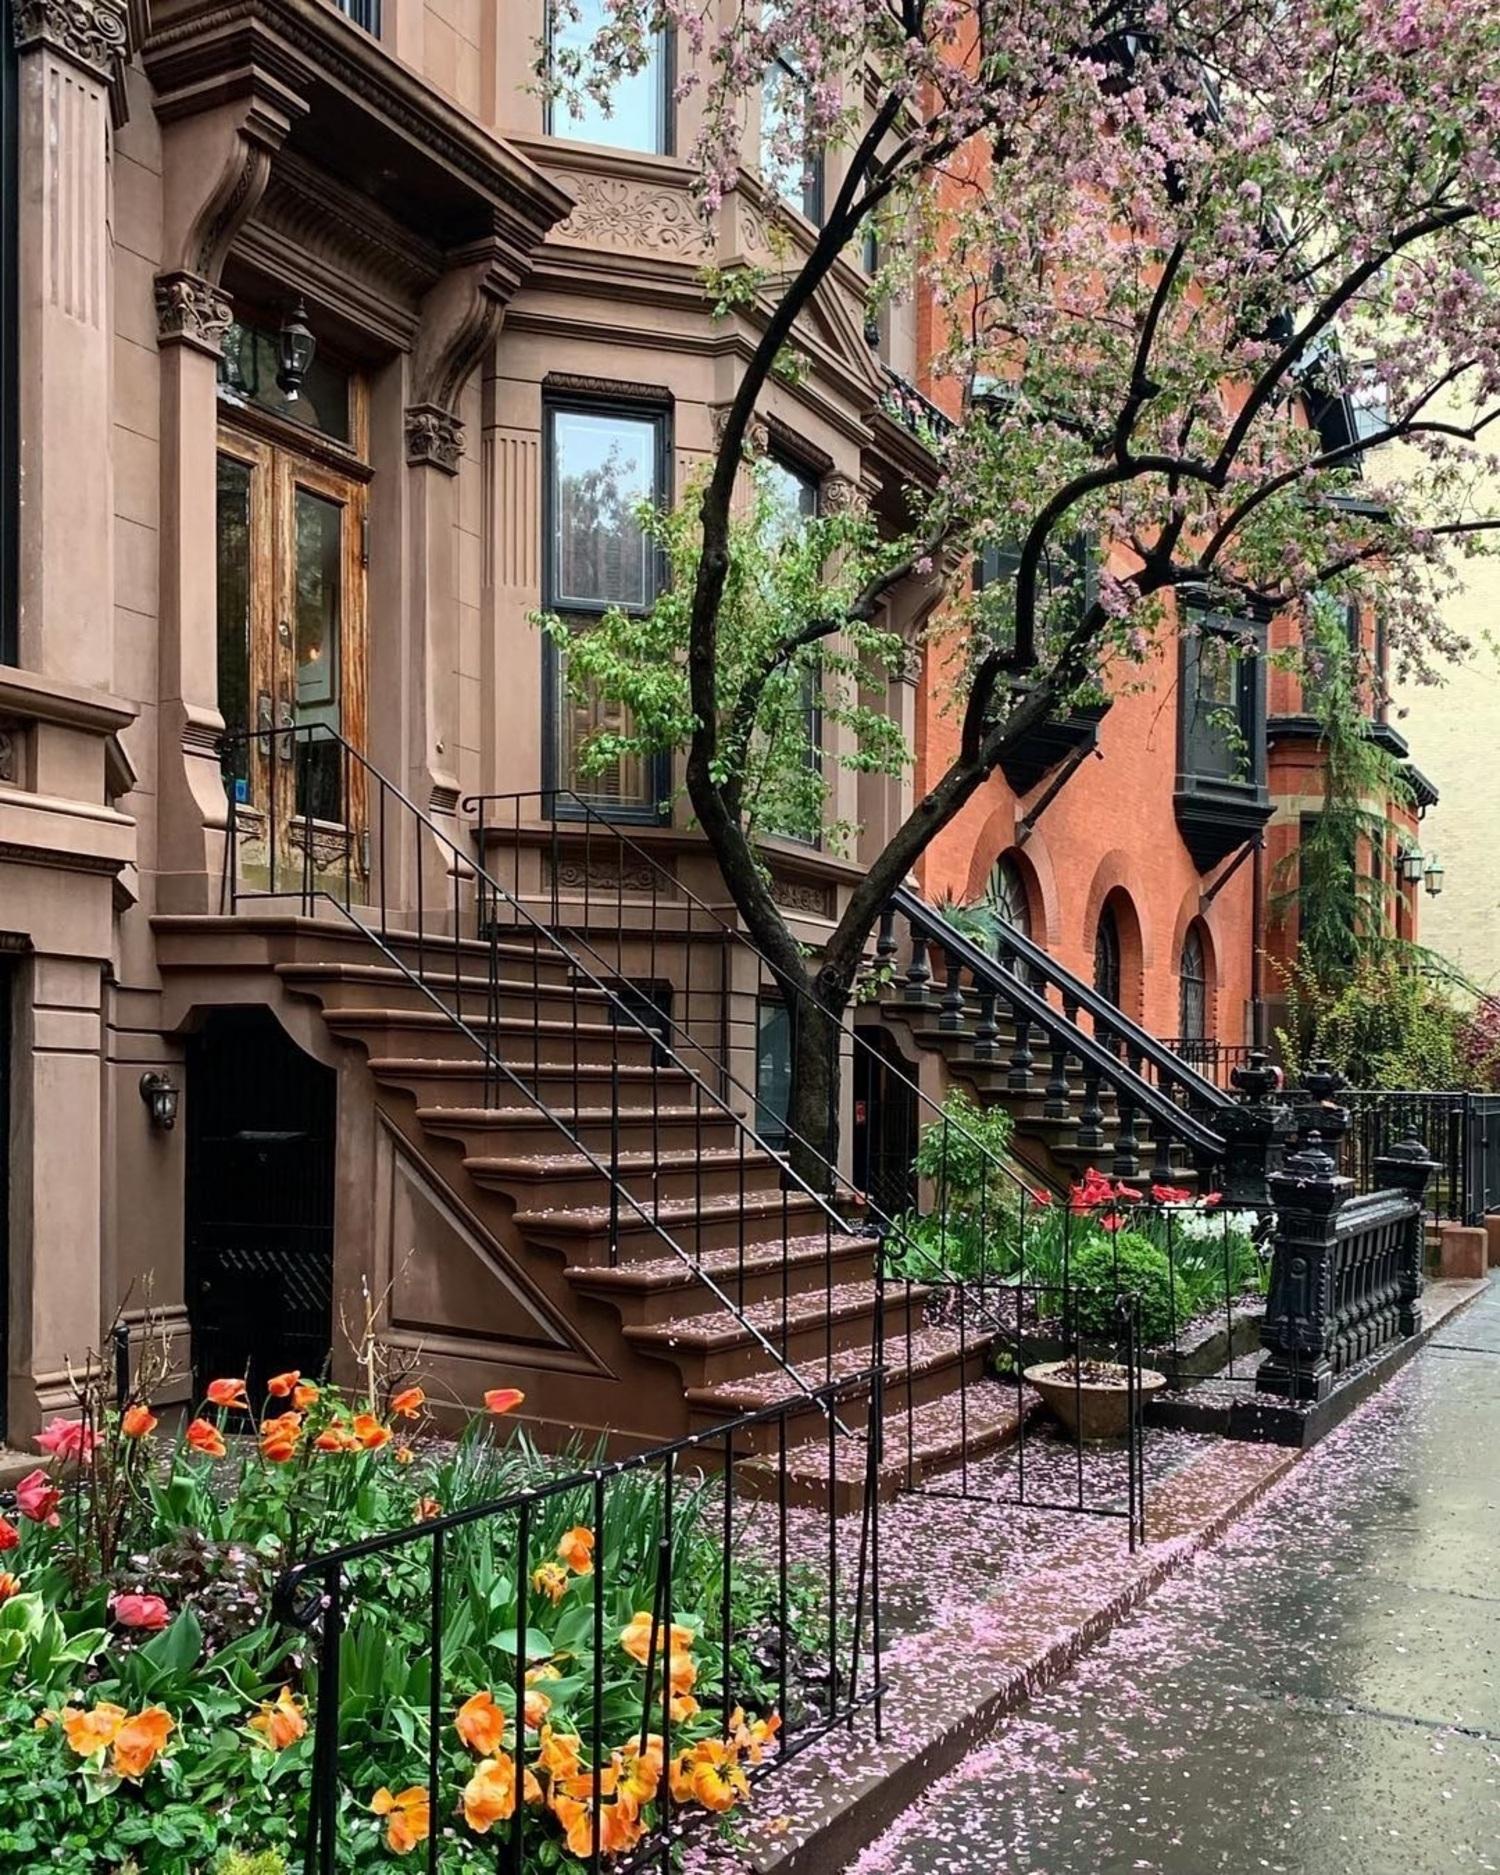 Park Slope, Brooklyn. Photo via @madufault #viewingnyc #nyc #newyork #newyorkcity #rain